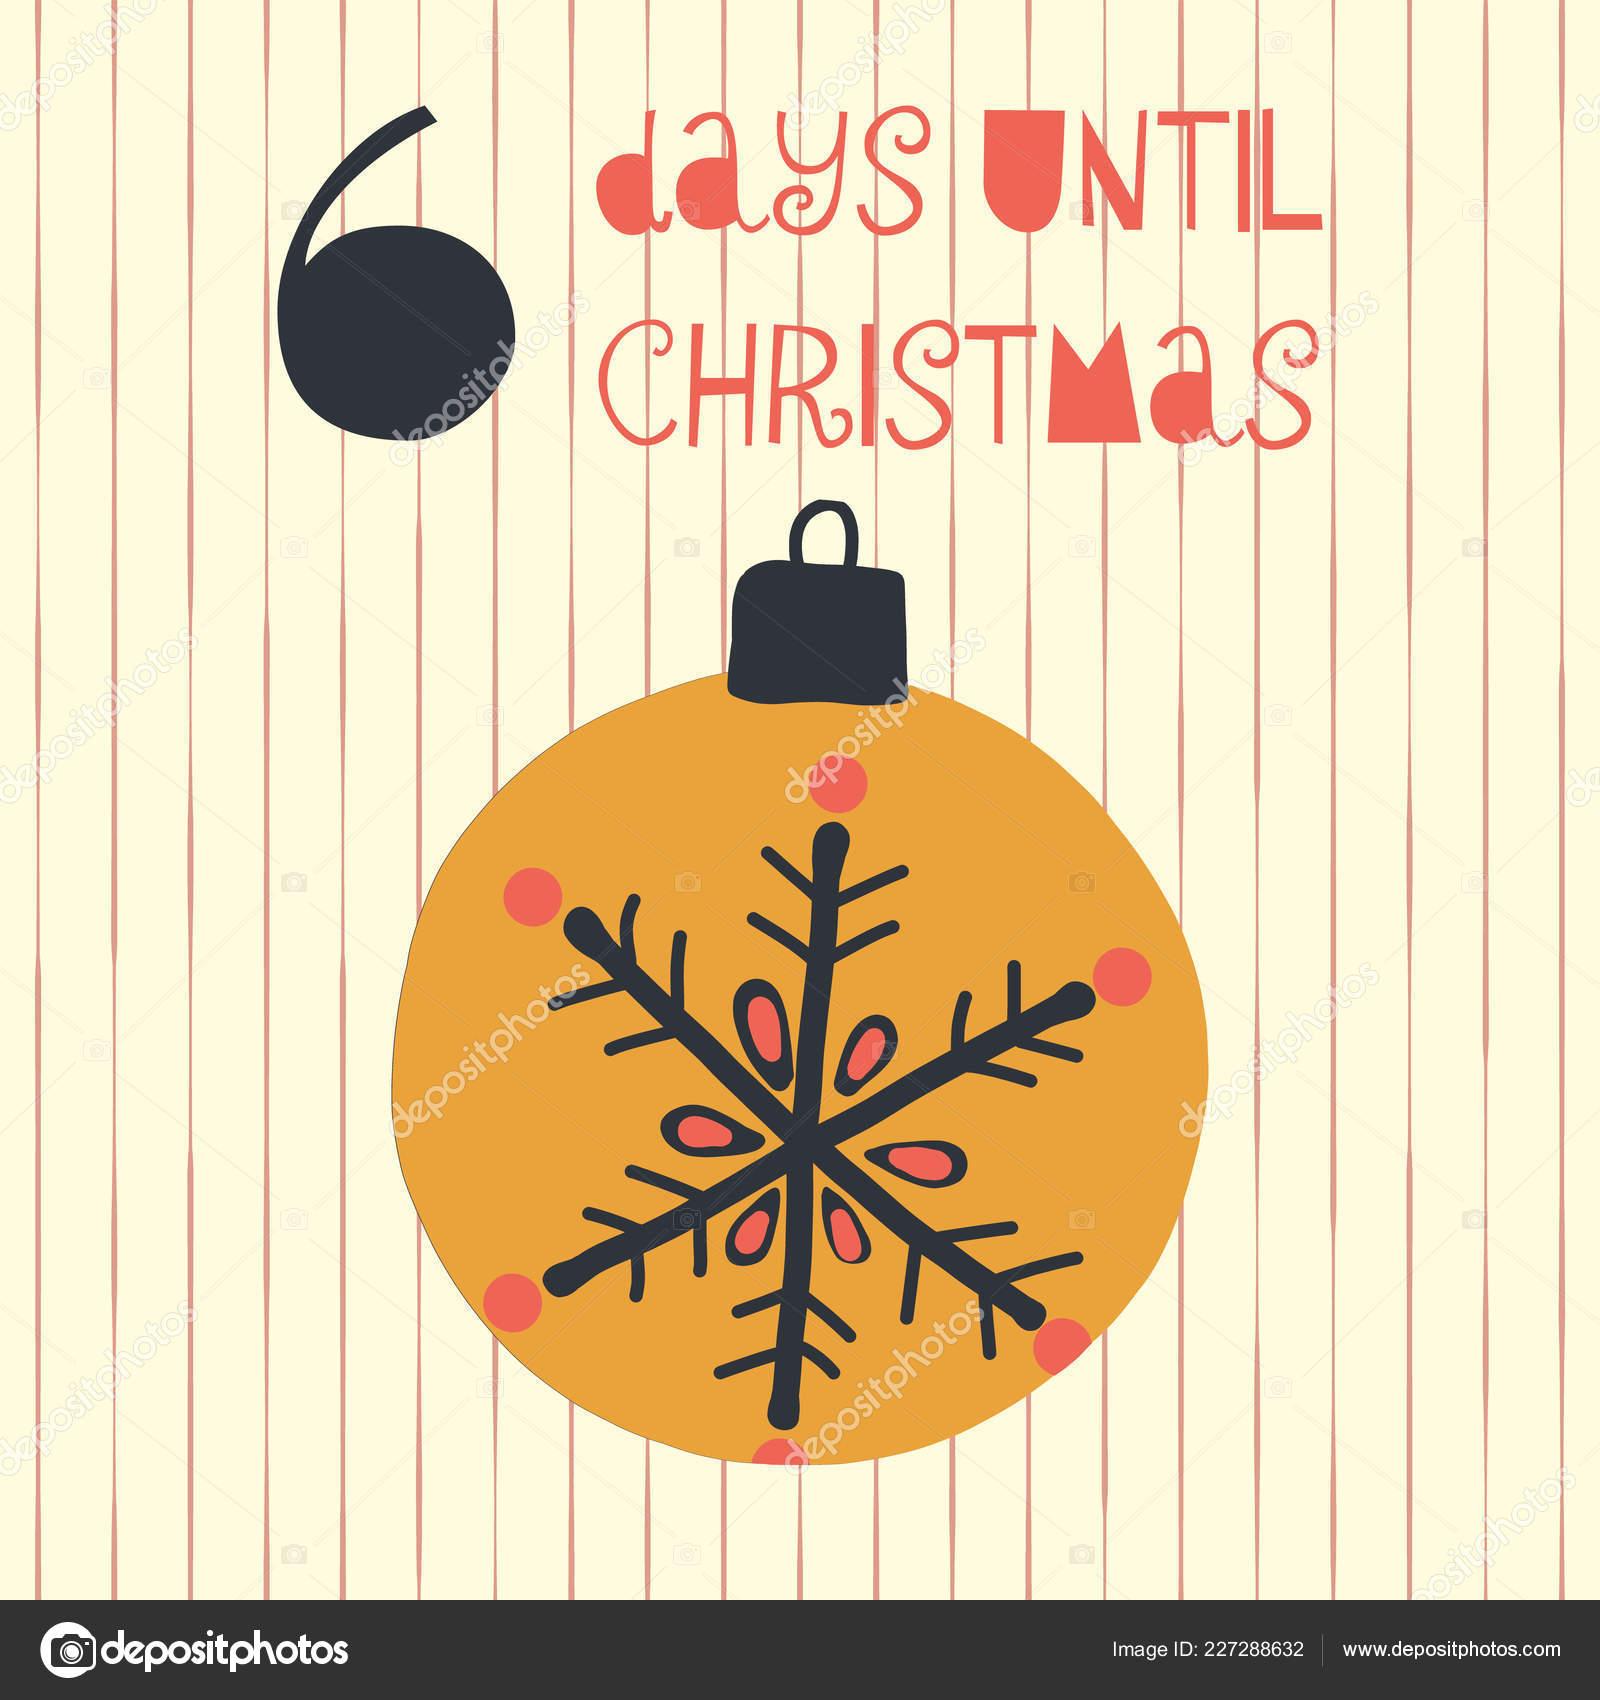 Countdown Till Christmas.6 Days Till Christmas Days Christmas Vector Illustration